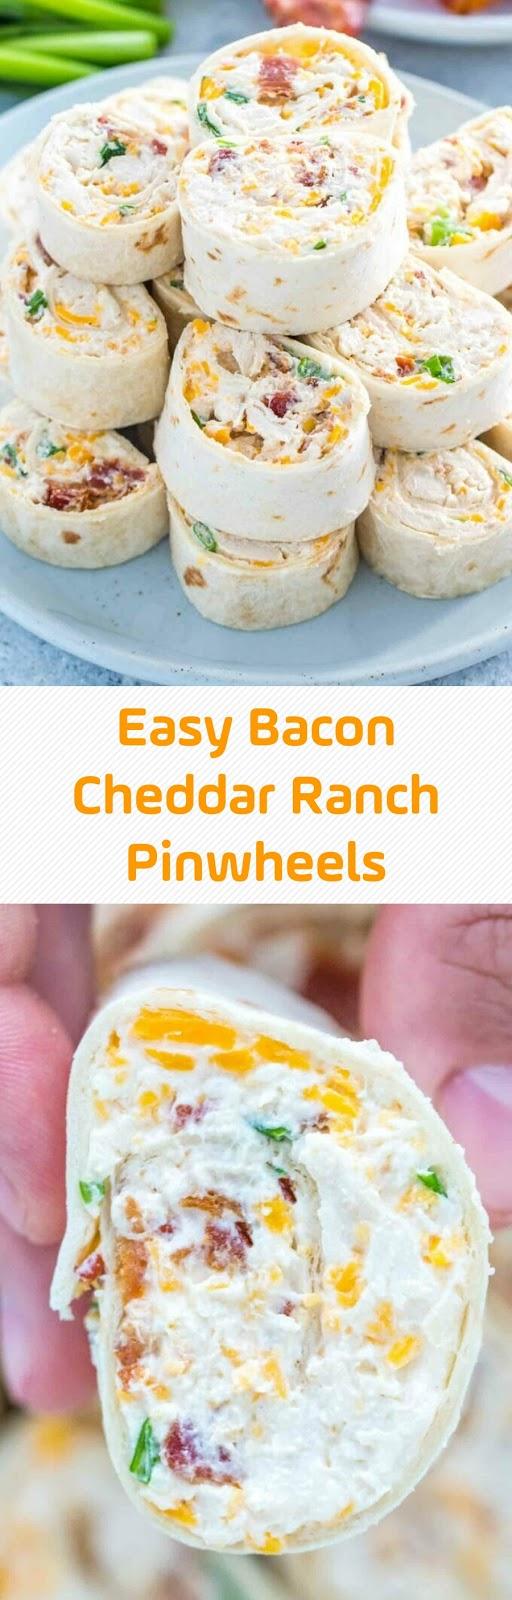 Easy Bacon Cheddar Ranch Pinwheels